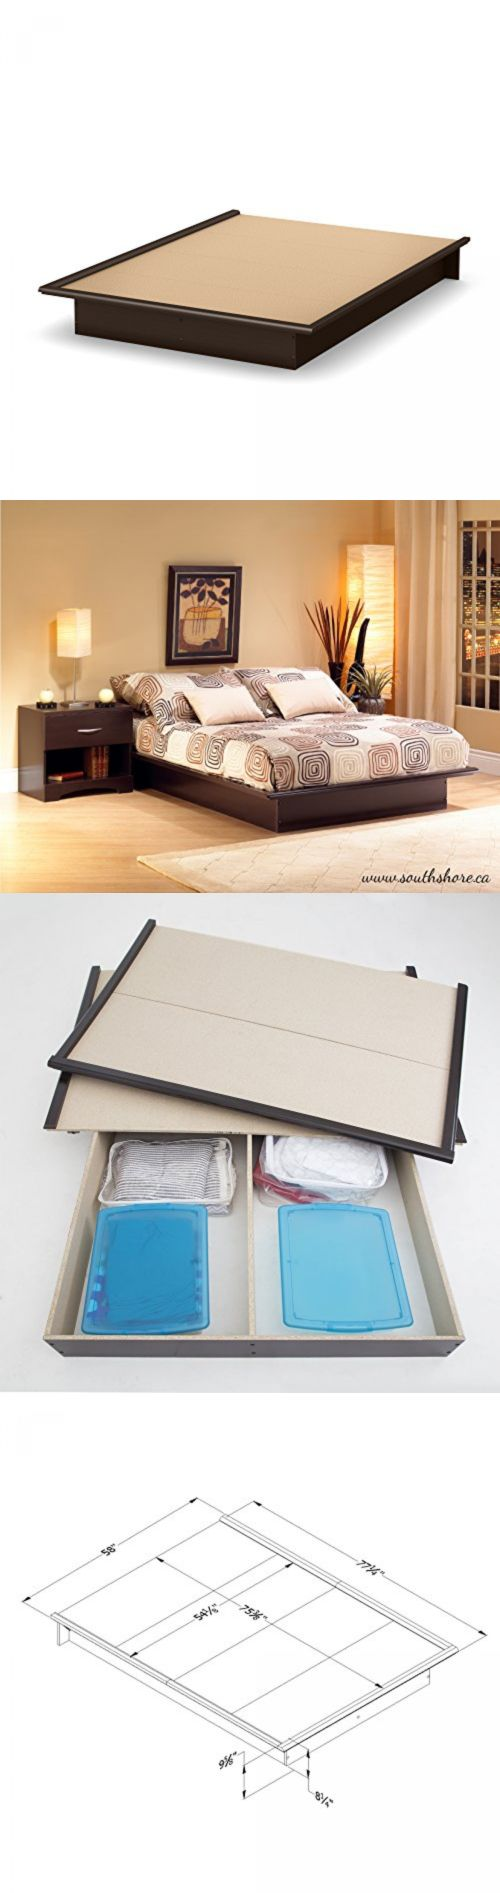 furniture: Modern Bedroom Furniture Queen Size Platform Bed Frame Brown Wood Foundation -> BUY IT NOW ONLY: $137.43 on eBay!